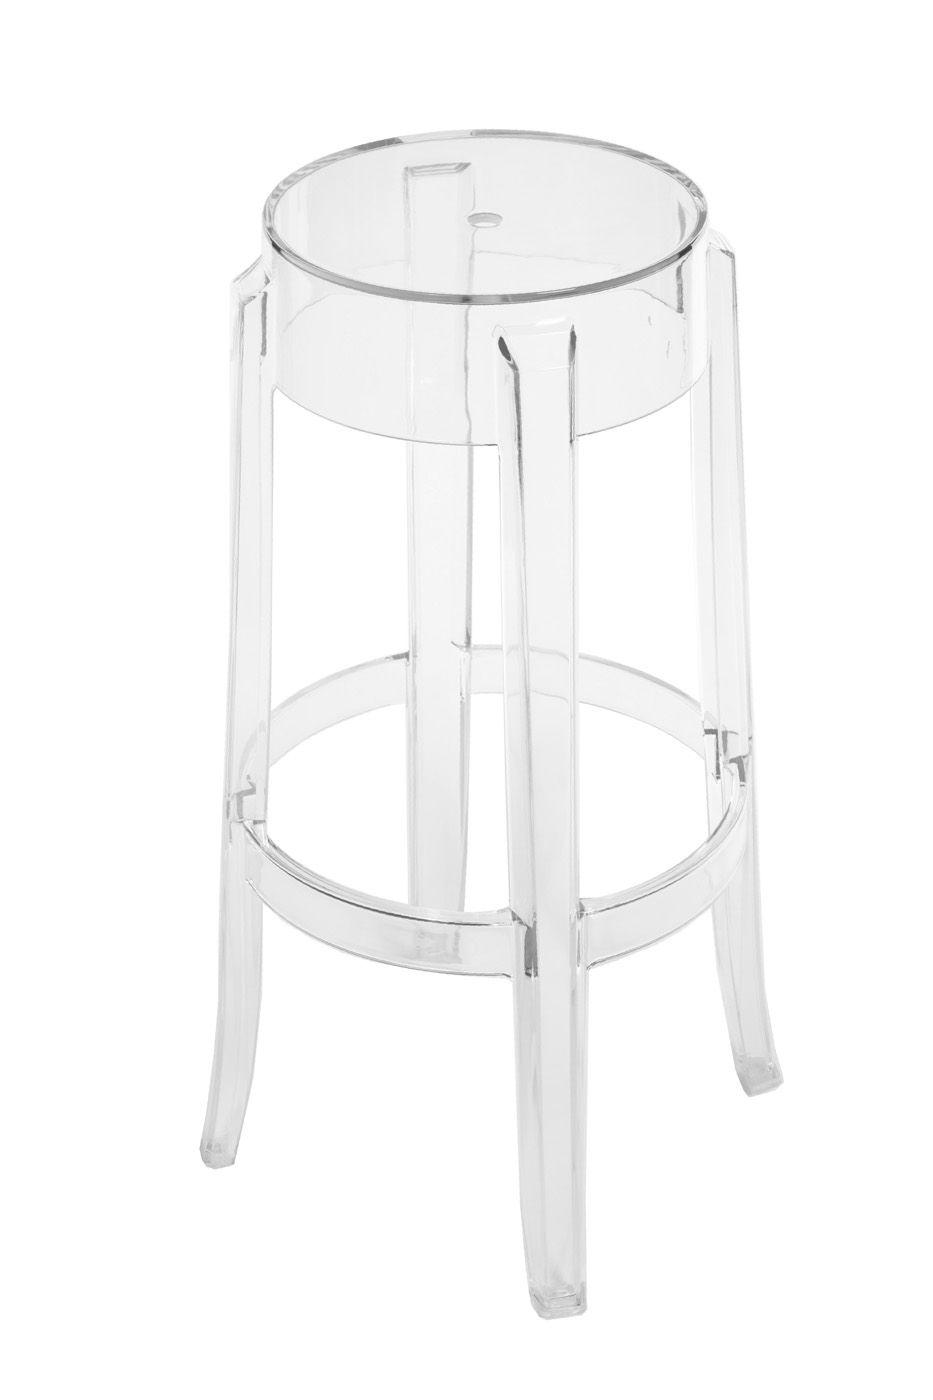 Стул Bradex барный Charles Ghost, прозрачный барный стул цвет мебели bn1012 wy451 черный